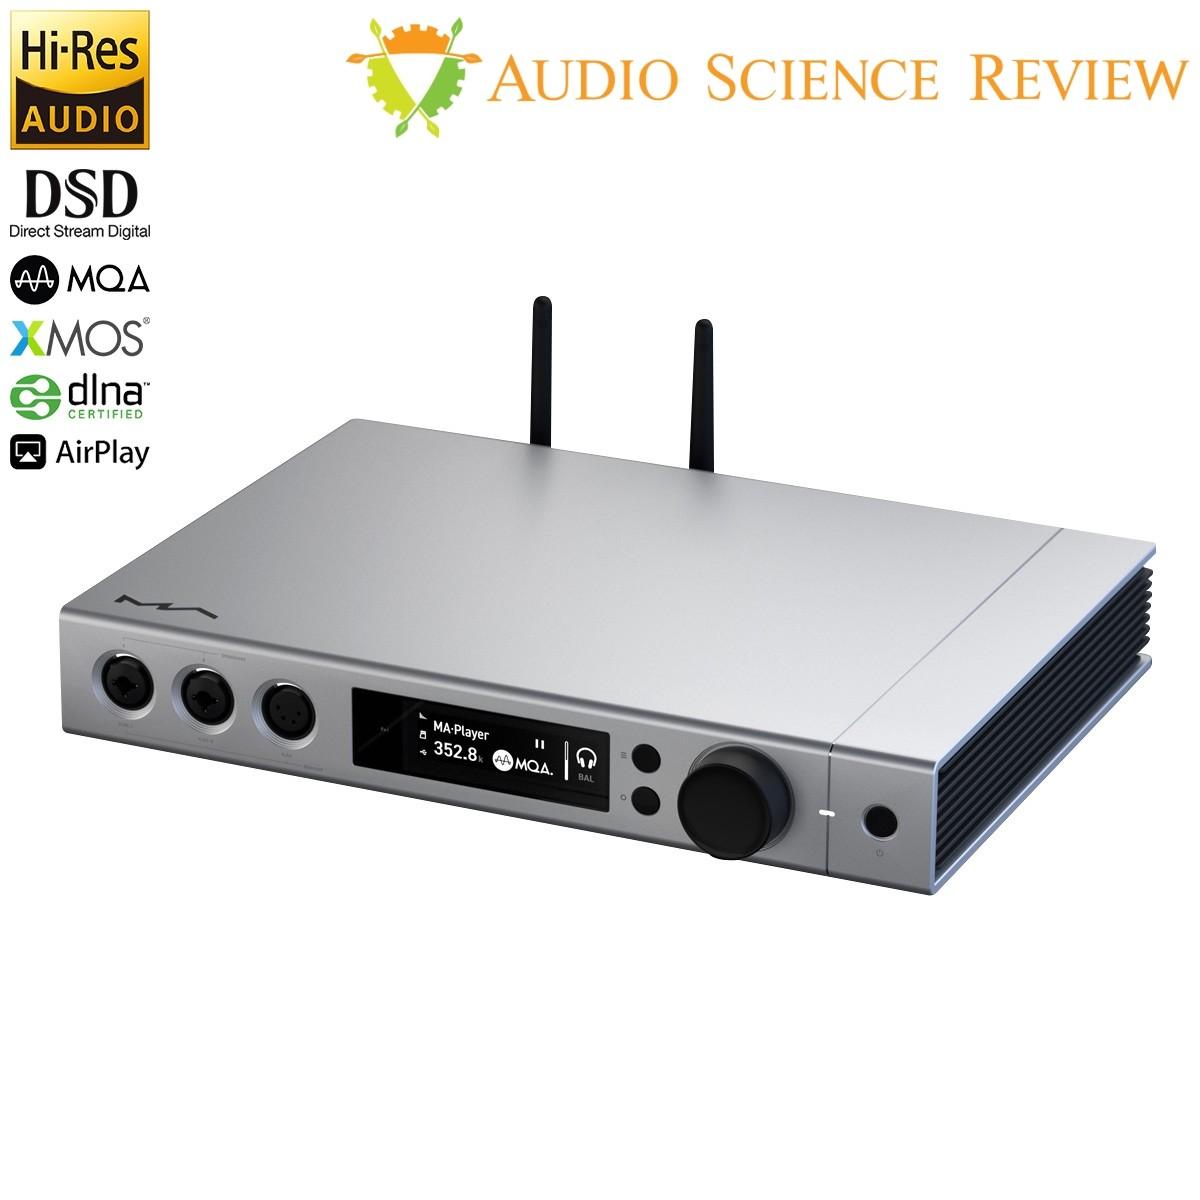 MATRIX ELEMENT X Streamer DAC ES9038PRO XMOS WiFi Femtoclock 32bit 768kHz DSD1024